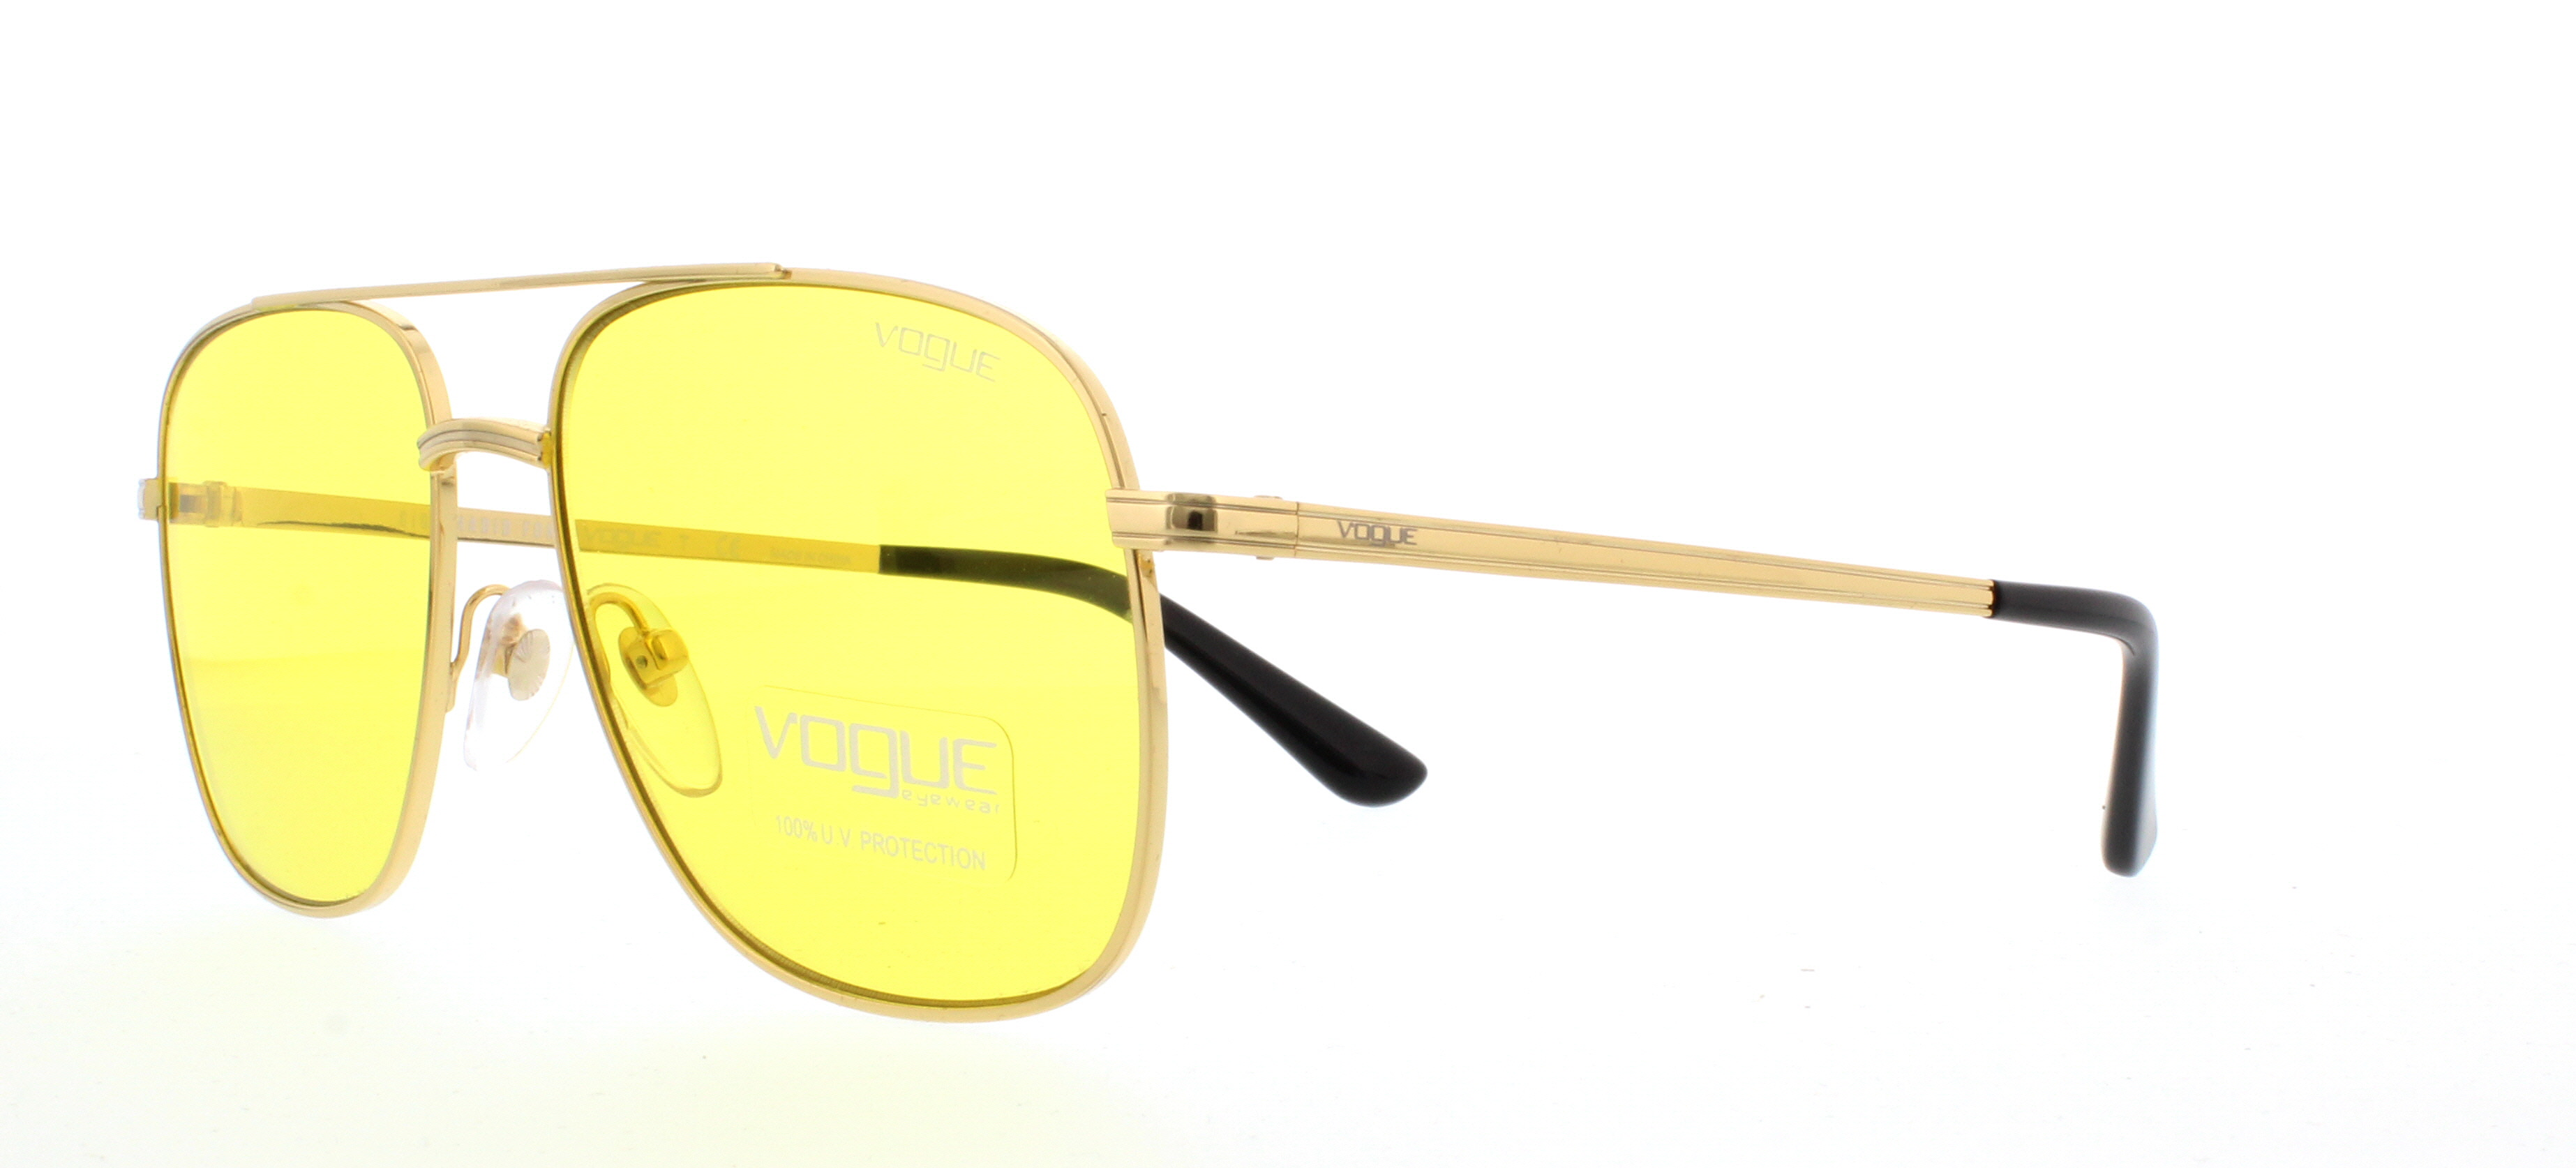 Vogue VO4083S 280/85 55 mm/16 mm oqW8H